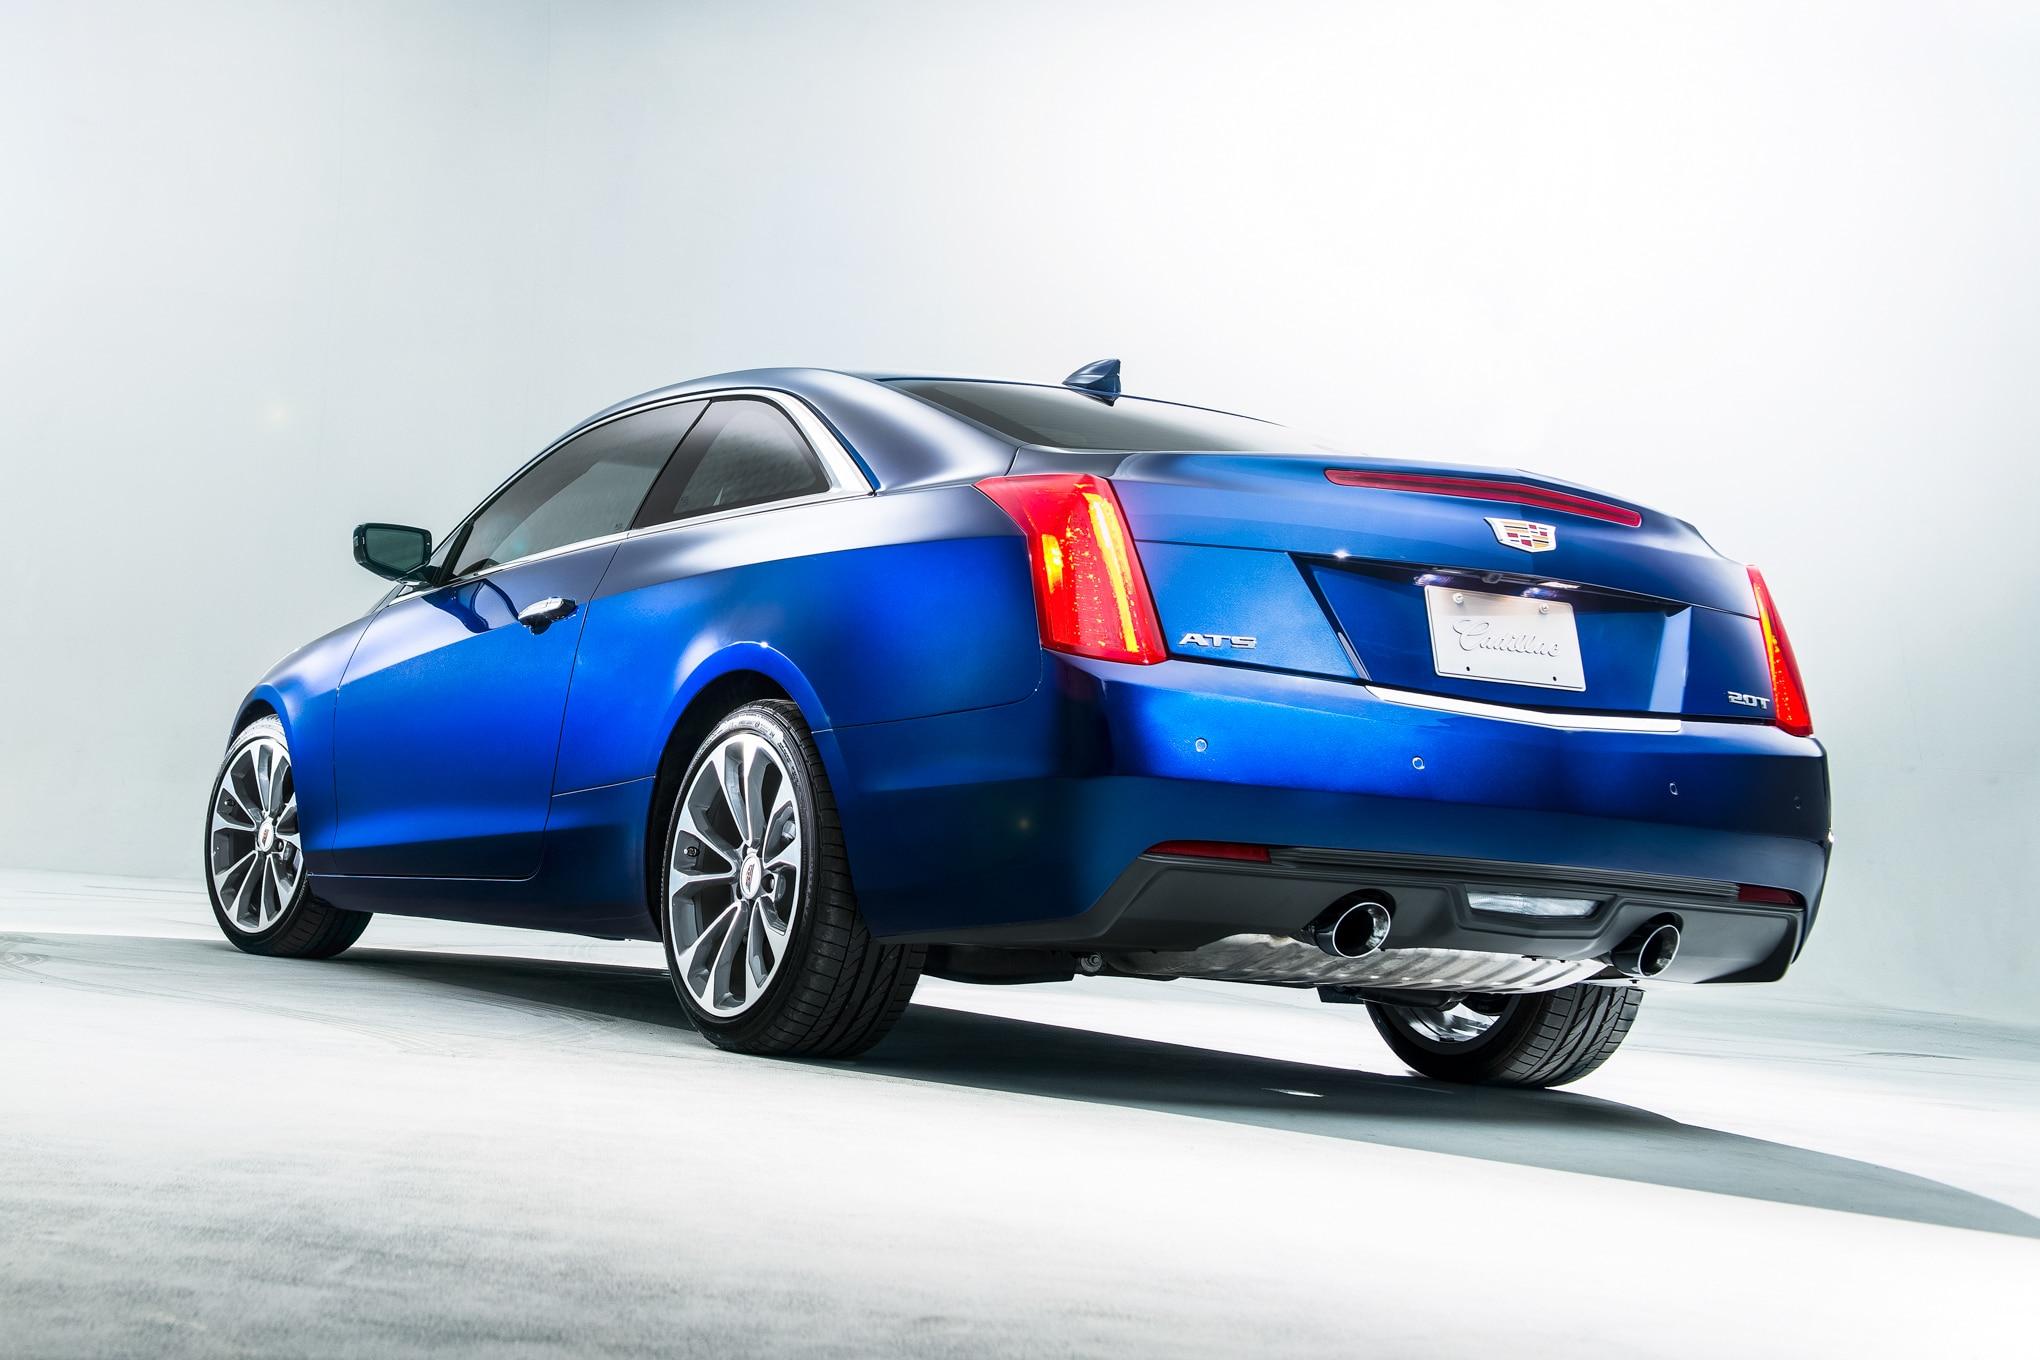 2015 Cadillac ATS Coupe Rear View1